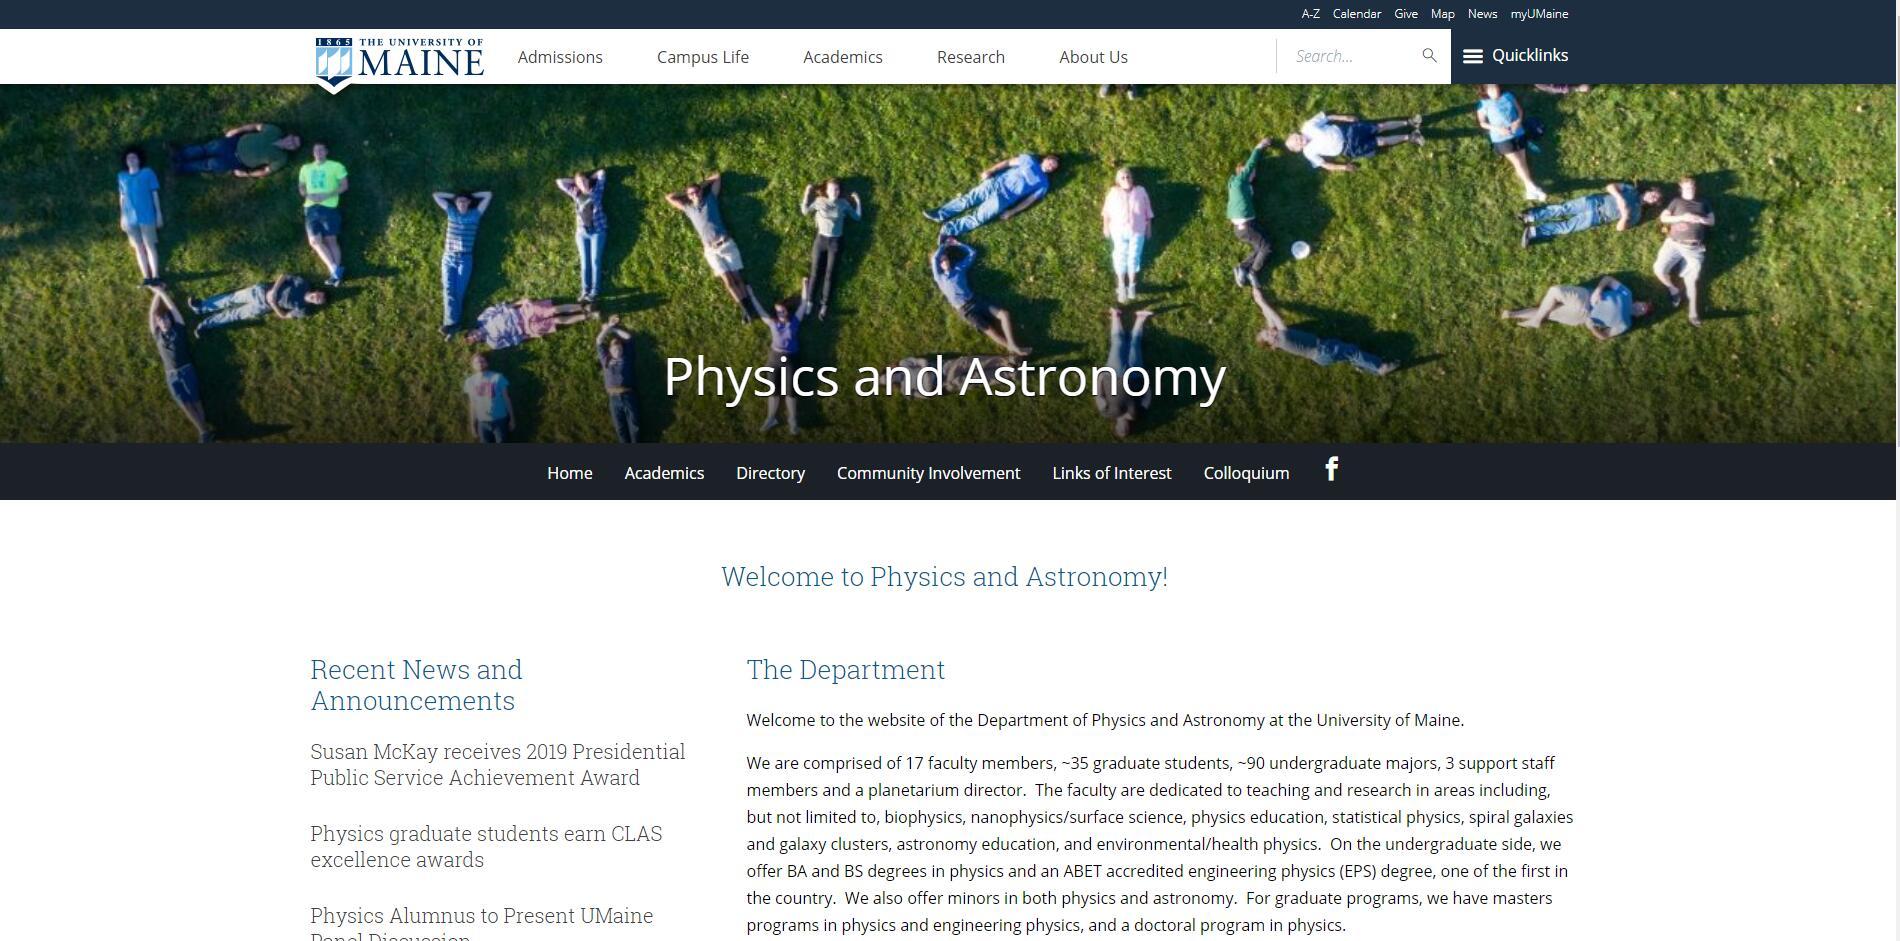 Top Physics Schools in Maine